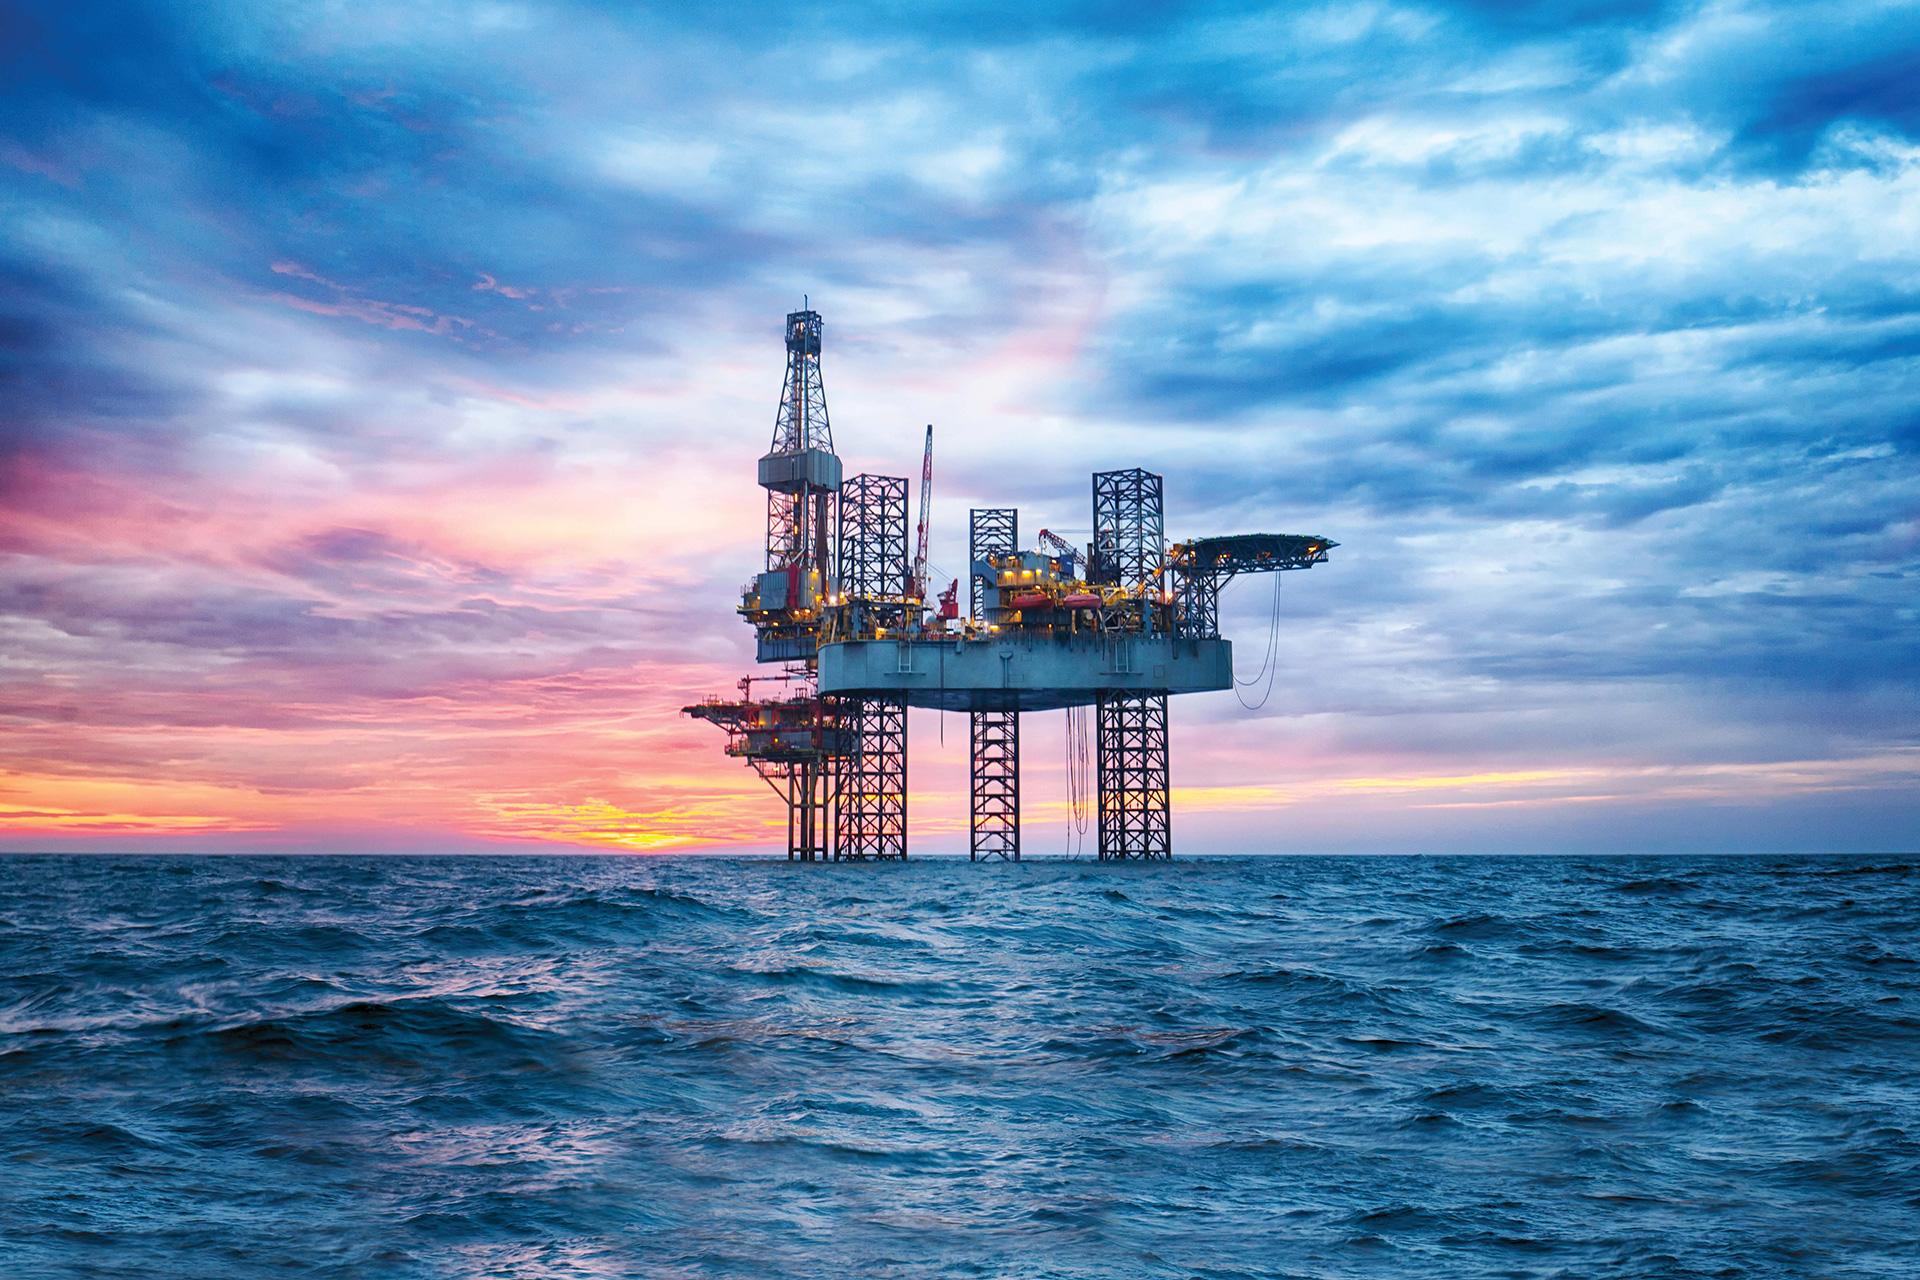 offshore-exploitation-using-lighter-underwater-pipes